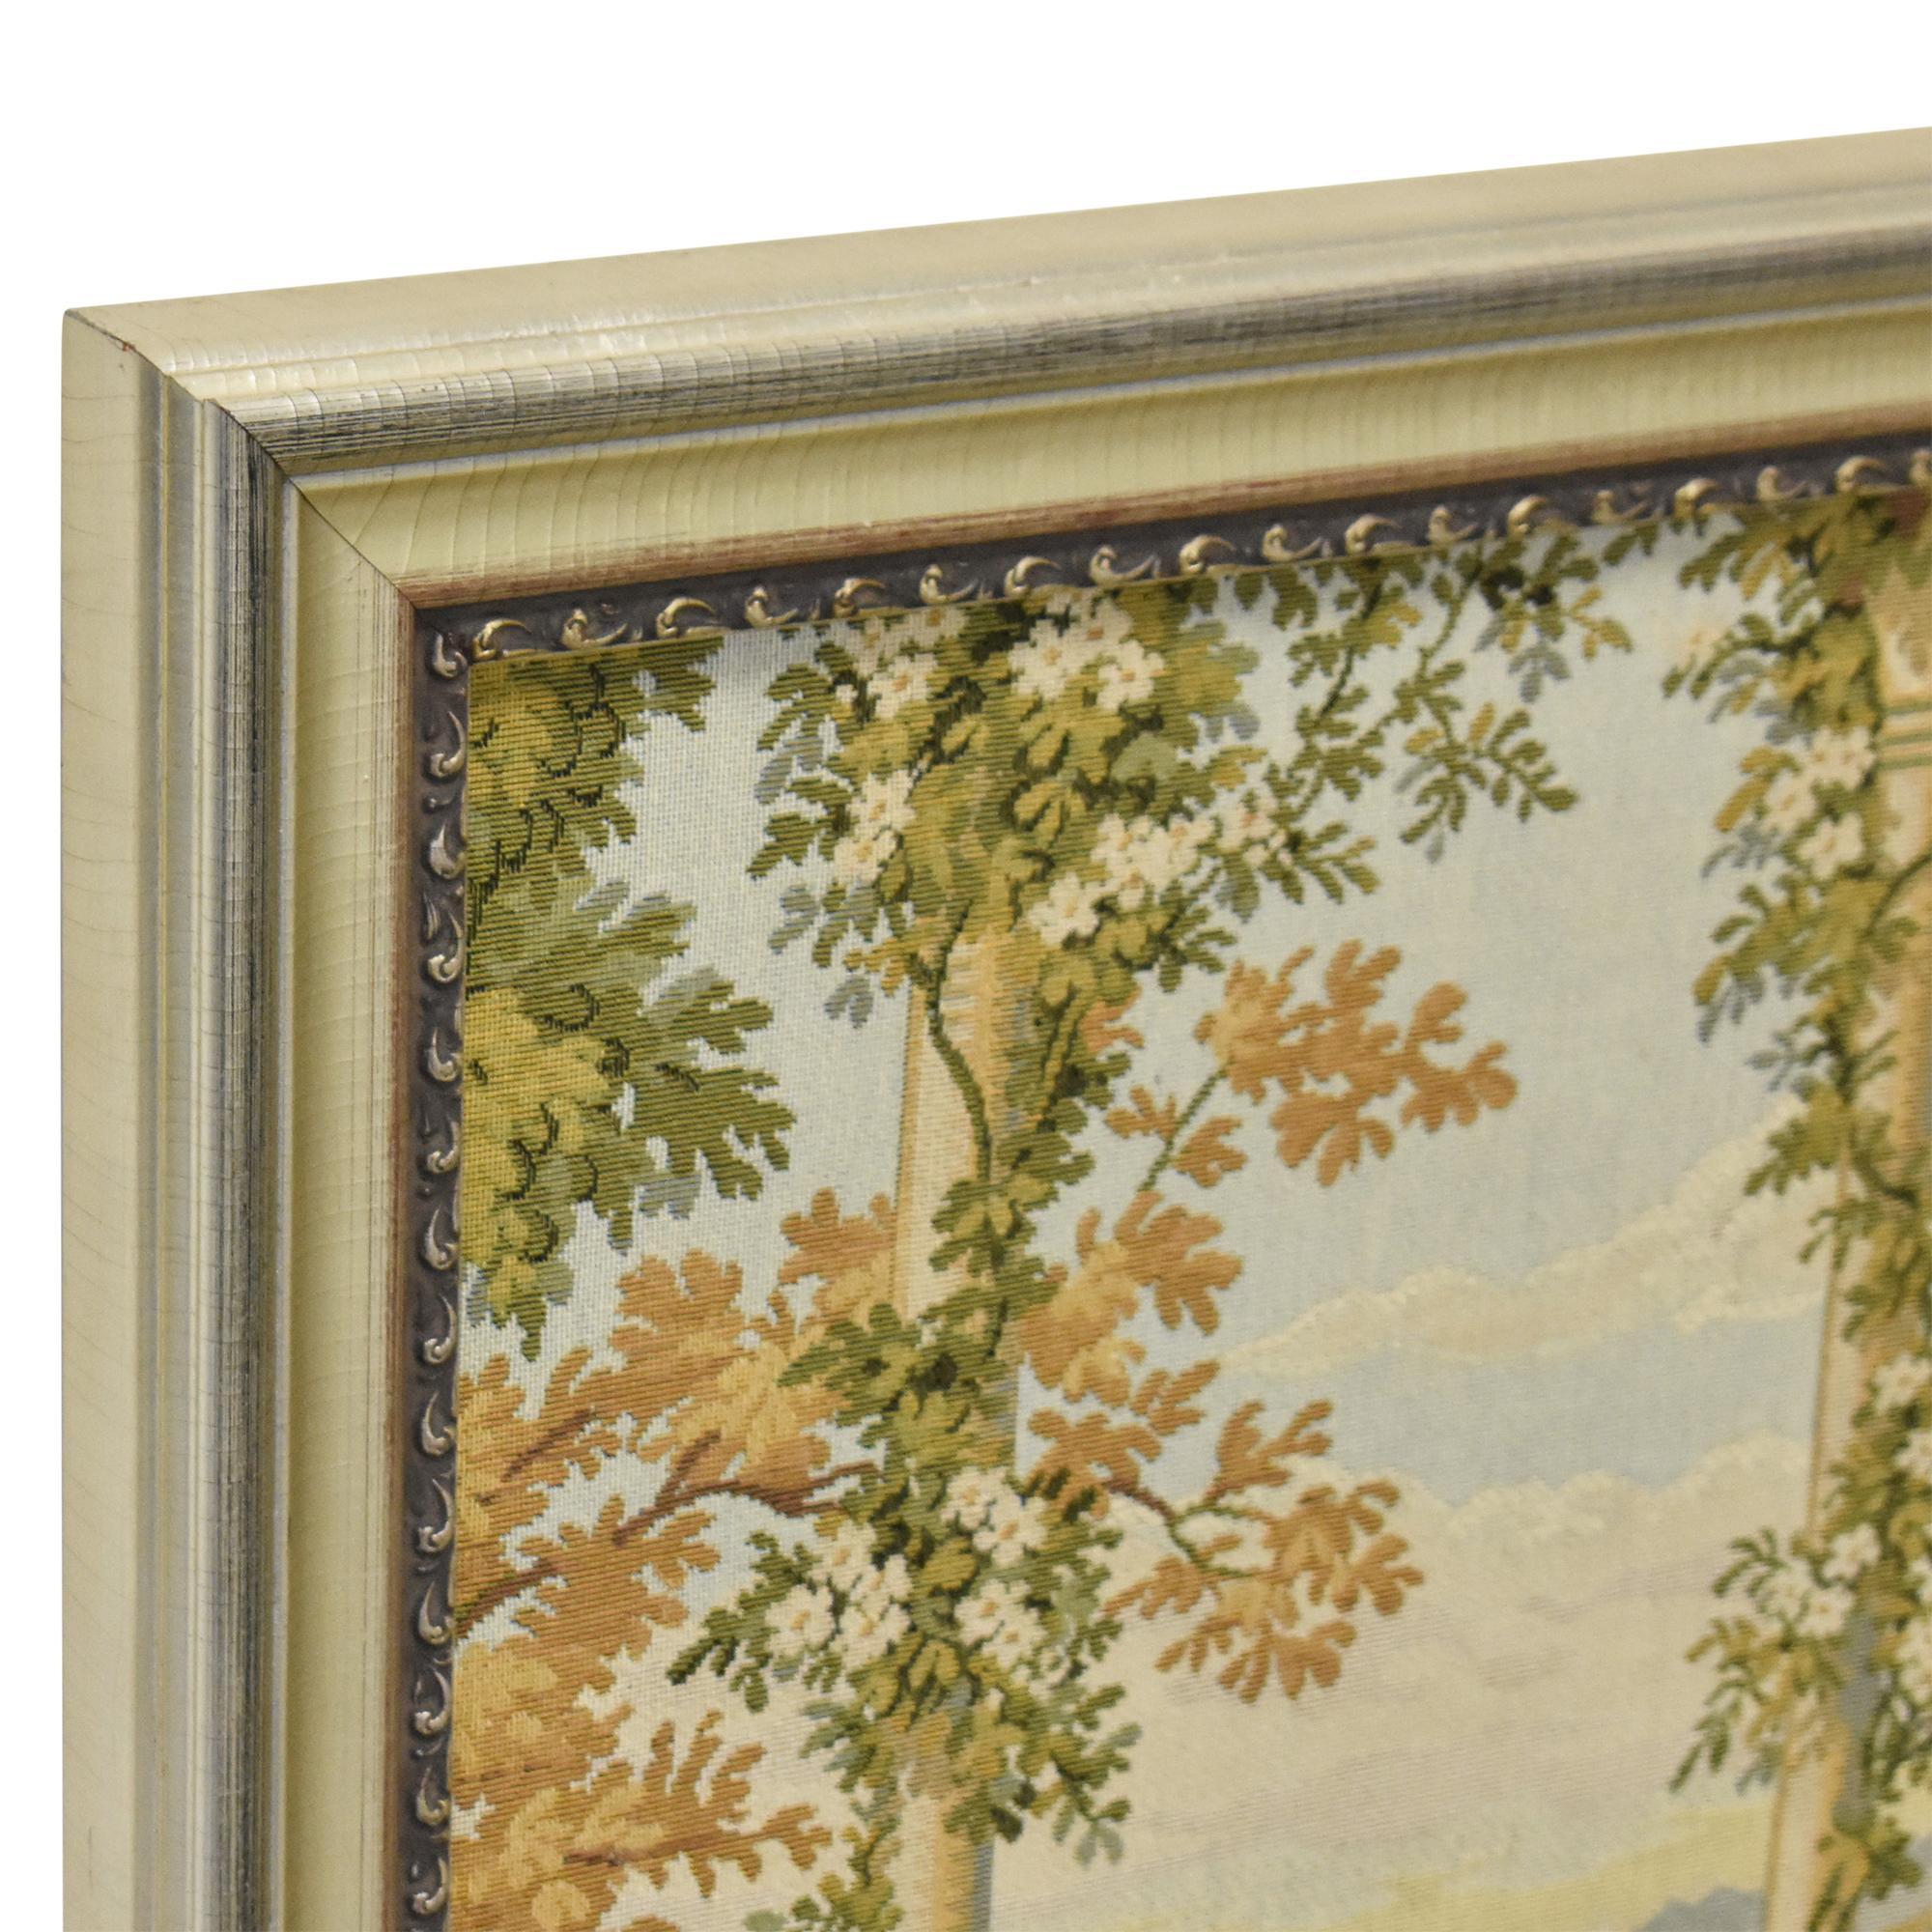 Framed Lake Como Tapestry dimensions